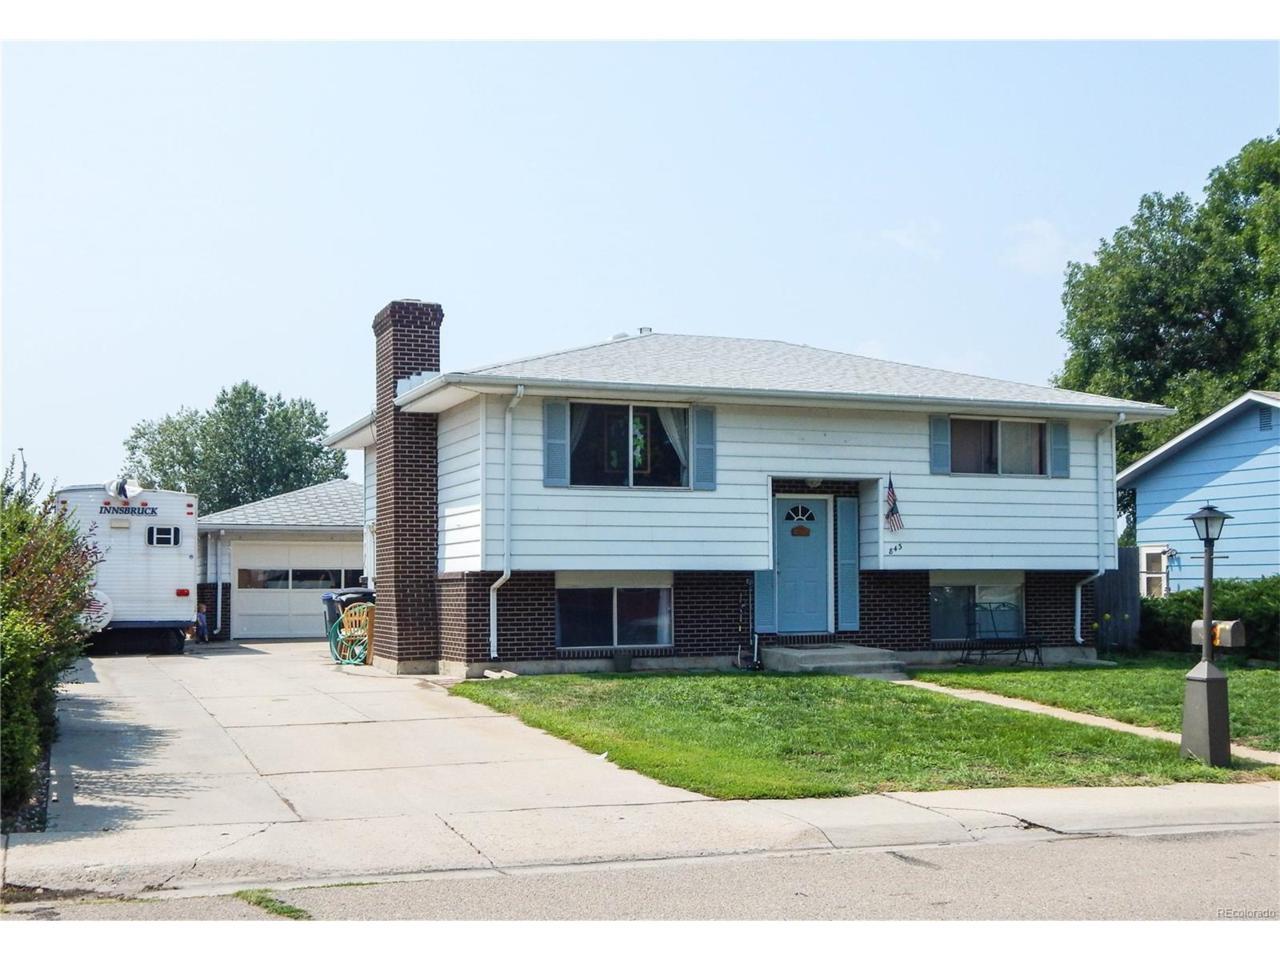 843 E 4th Avenue, Longmont, CO 80504 (MLS #1793946) :: 8z Real Estate